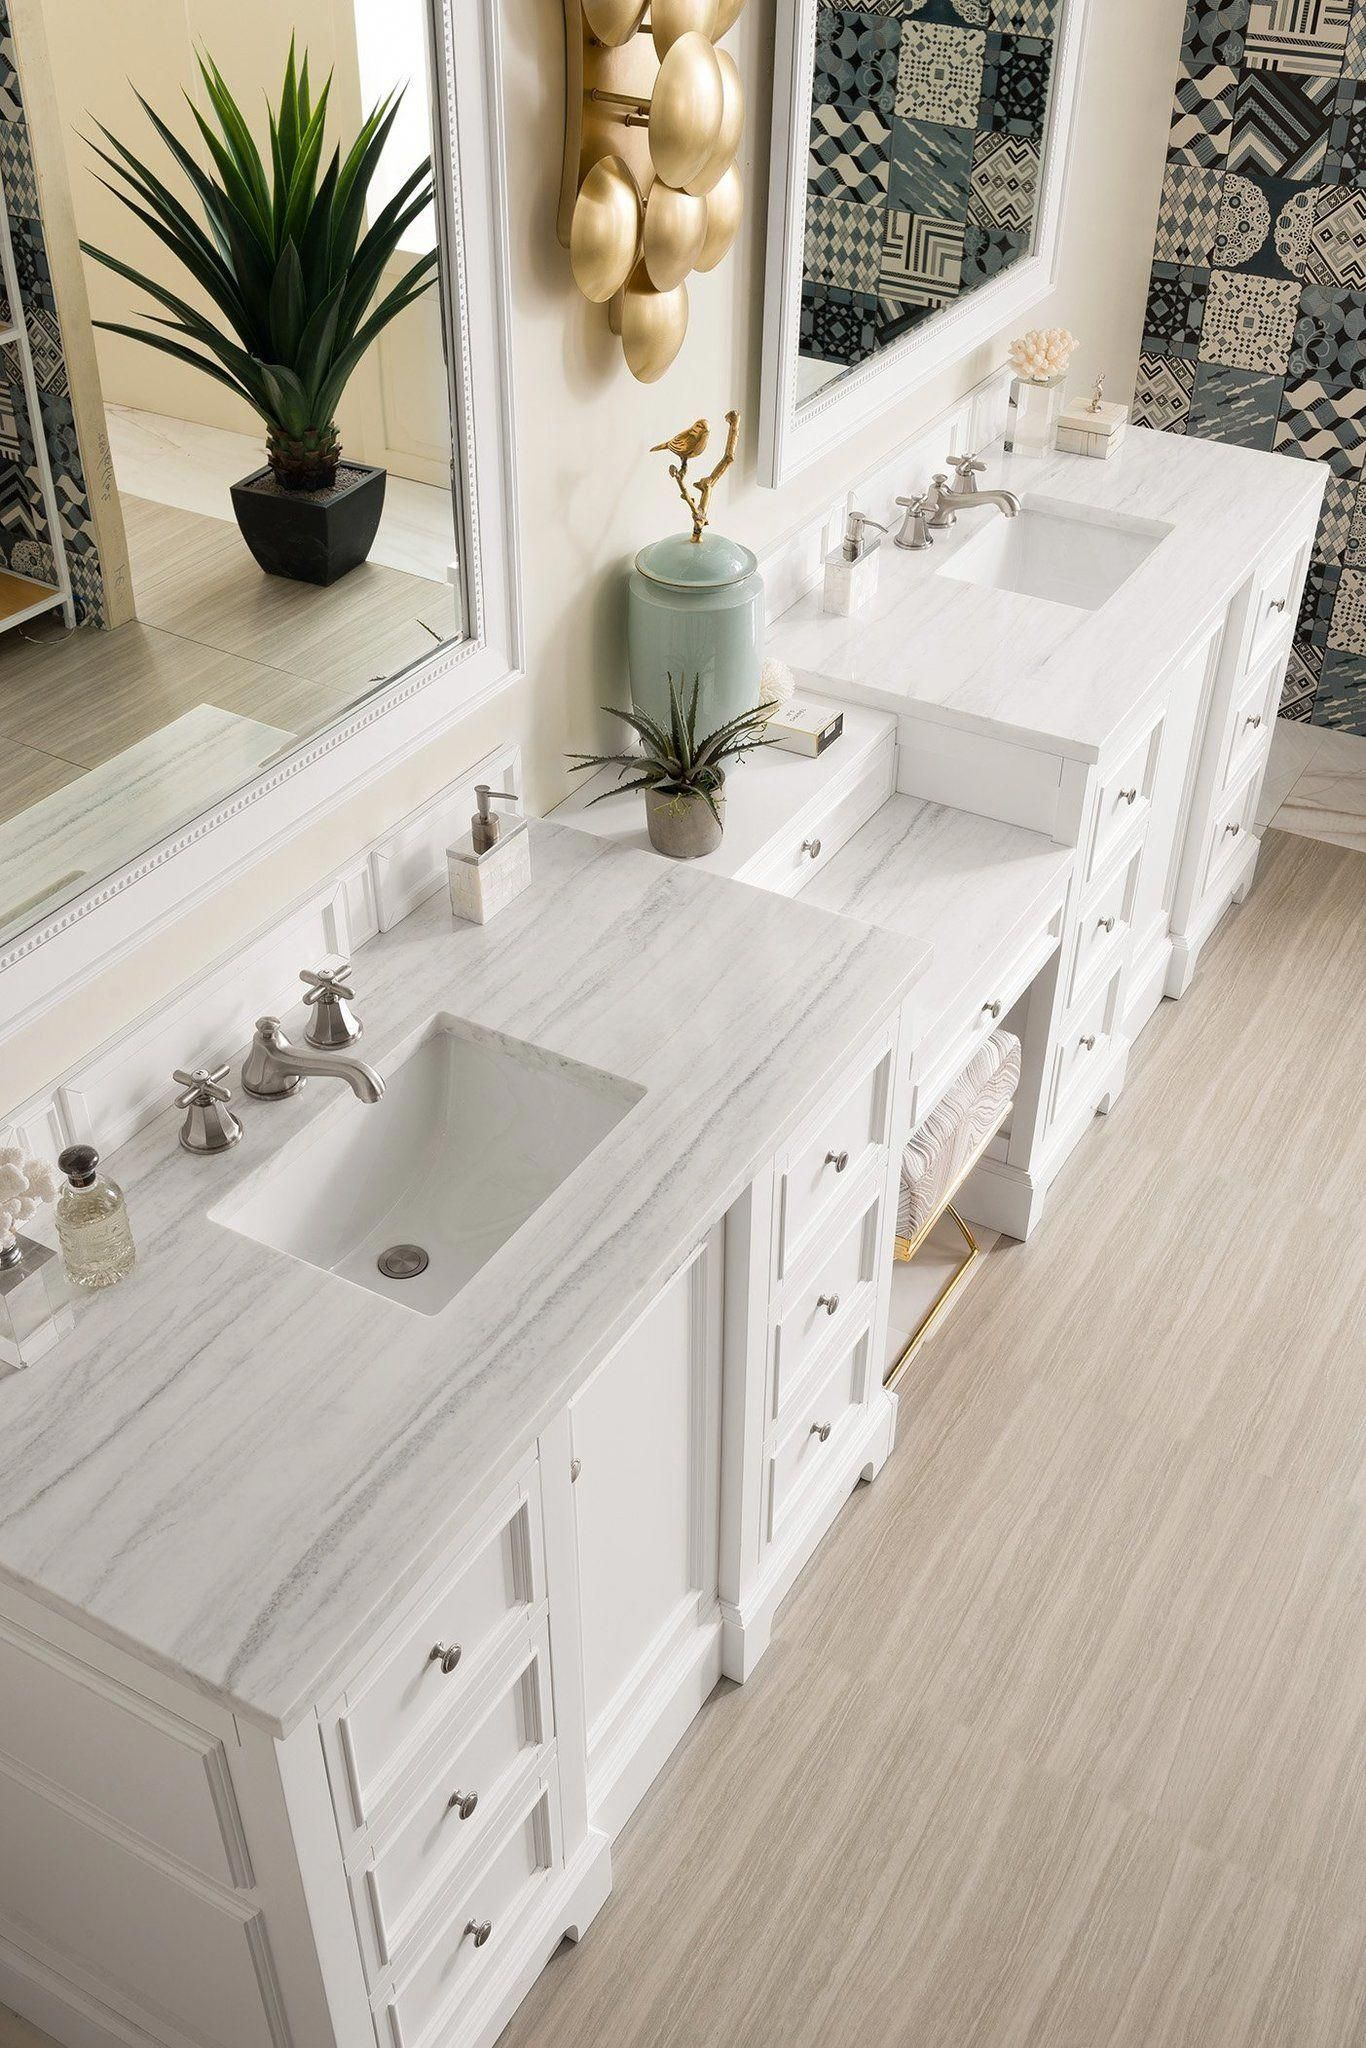 De Soto 118 Double Bathroom Vanity Weirdbathroomsink In 2020 Modern Master Bathroom Bathroom Sink Vanity